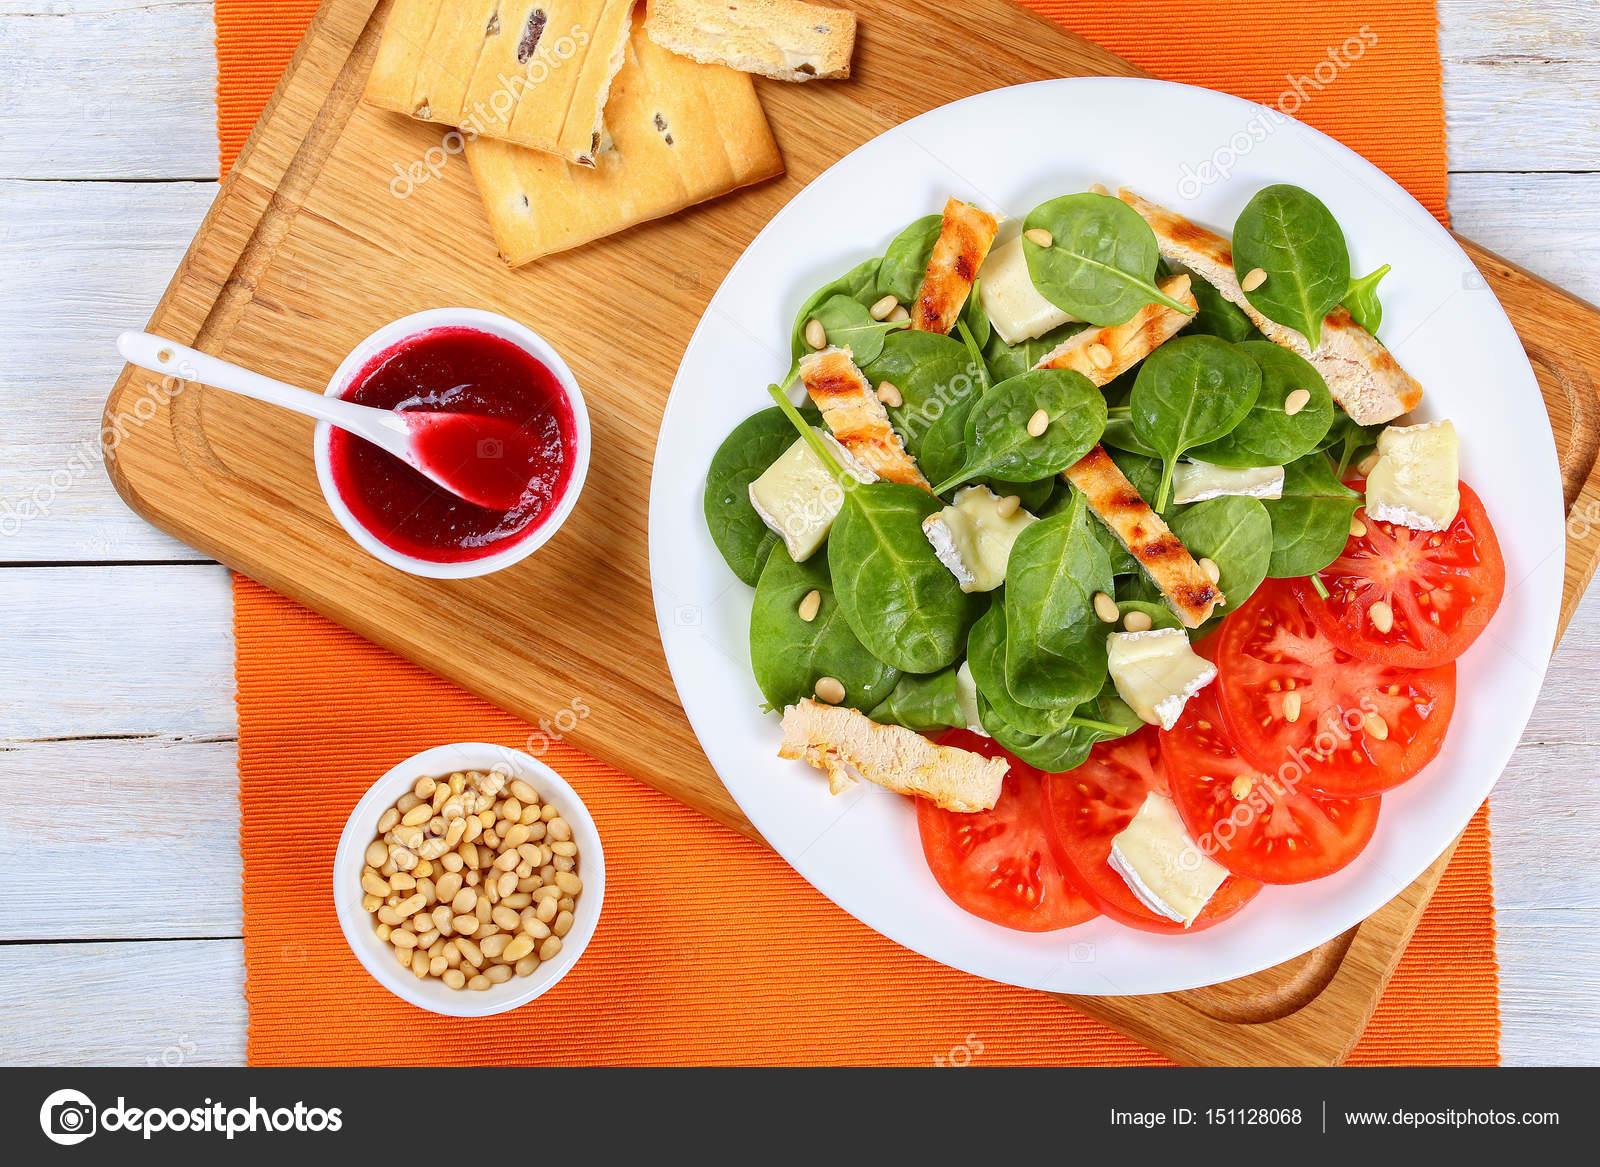 wenig kalorien spinat gegrillte h hnchen salat stockfoto myviewpoint 151128068. Black Bedroom Furniture Sets. Home Design Ideas